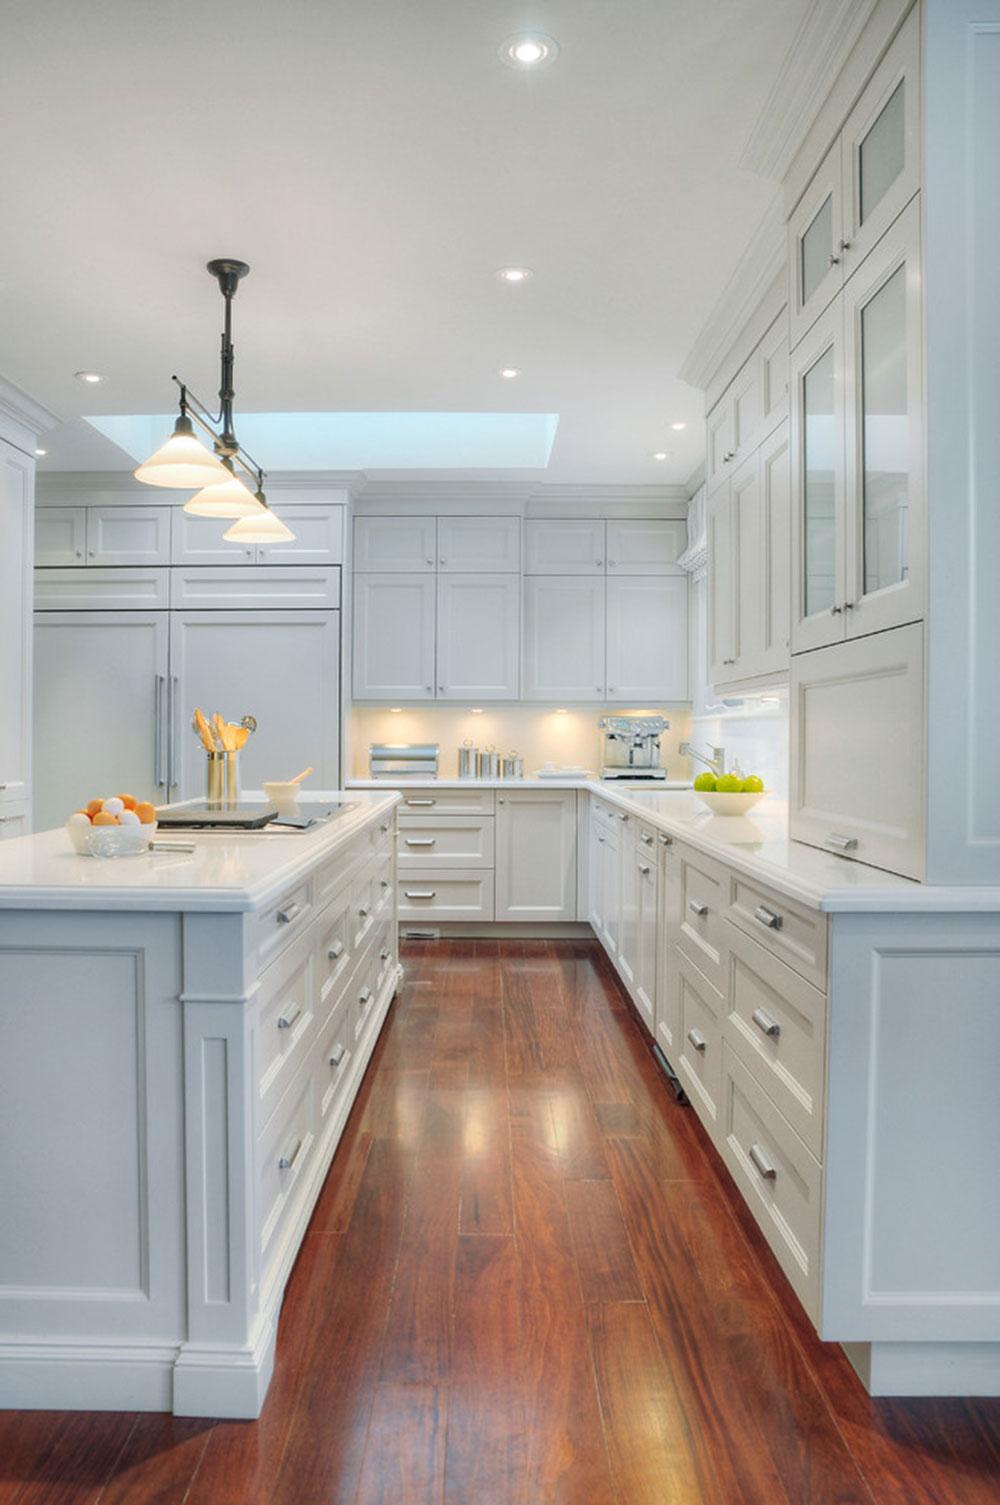 Brighten Your Kitchen With Sparkling White Quartz Countertop on Counter Top Decor  id=59505